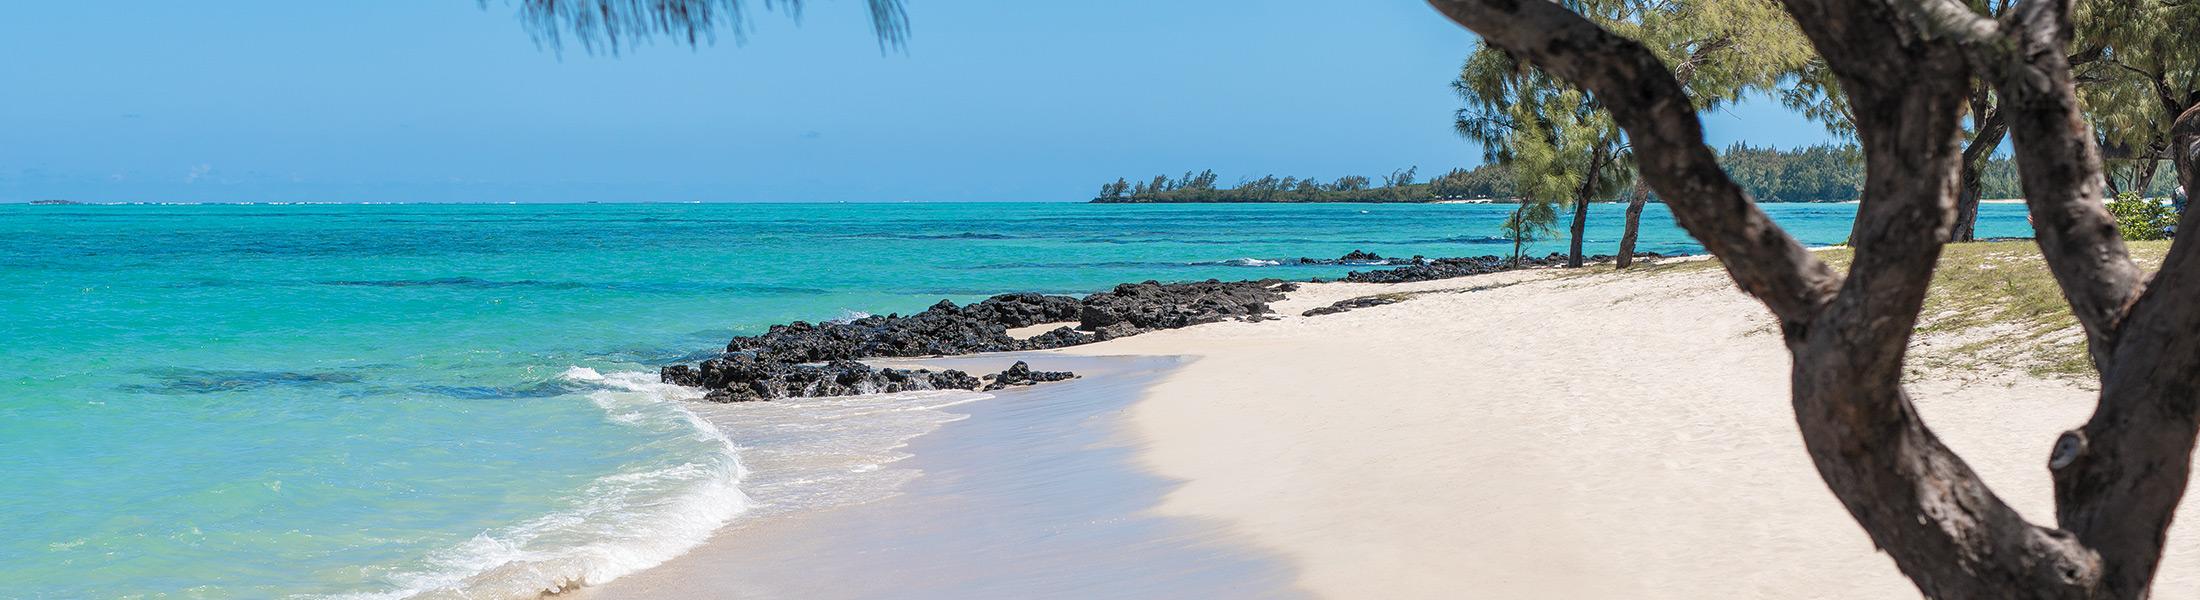 White sand beach on the private island at Shangri-La's Le Touessrok Mauritius